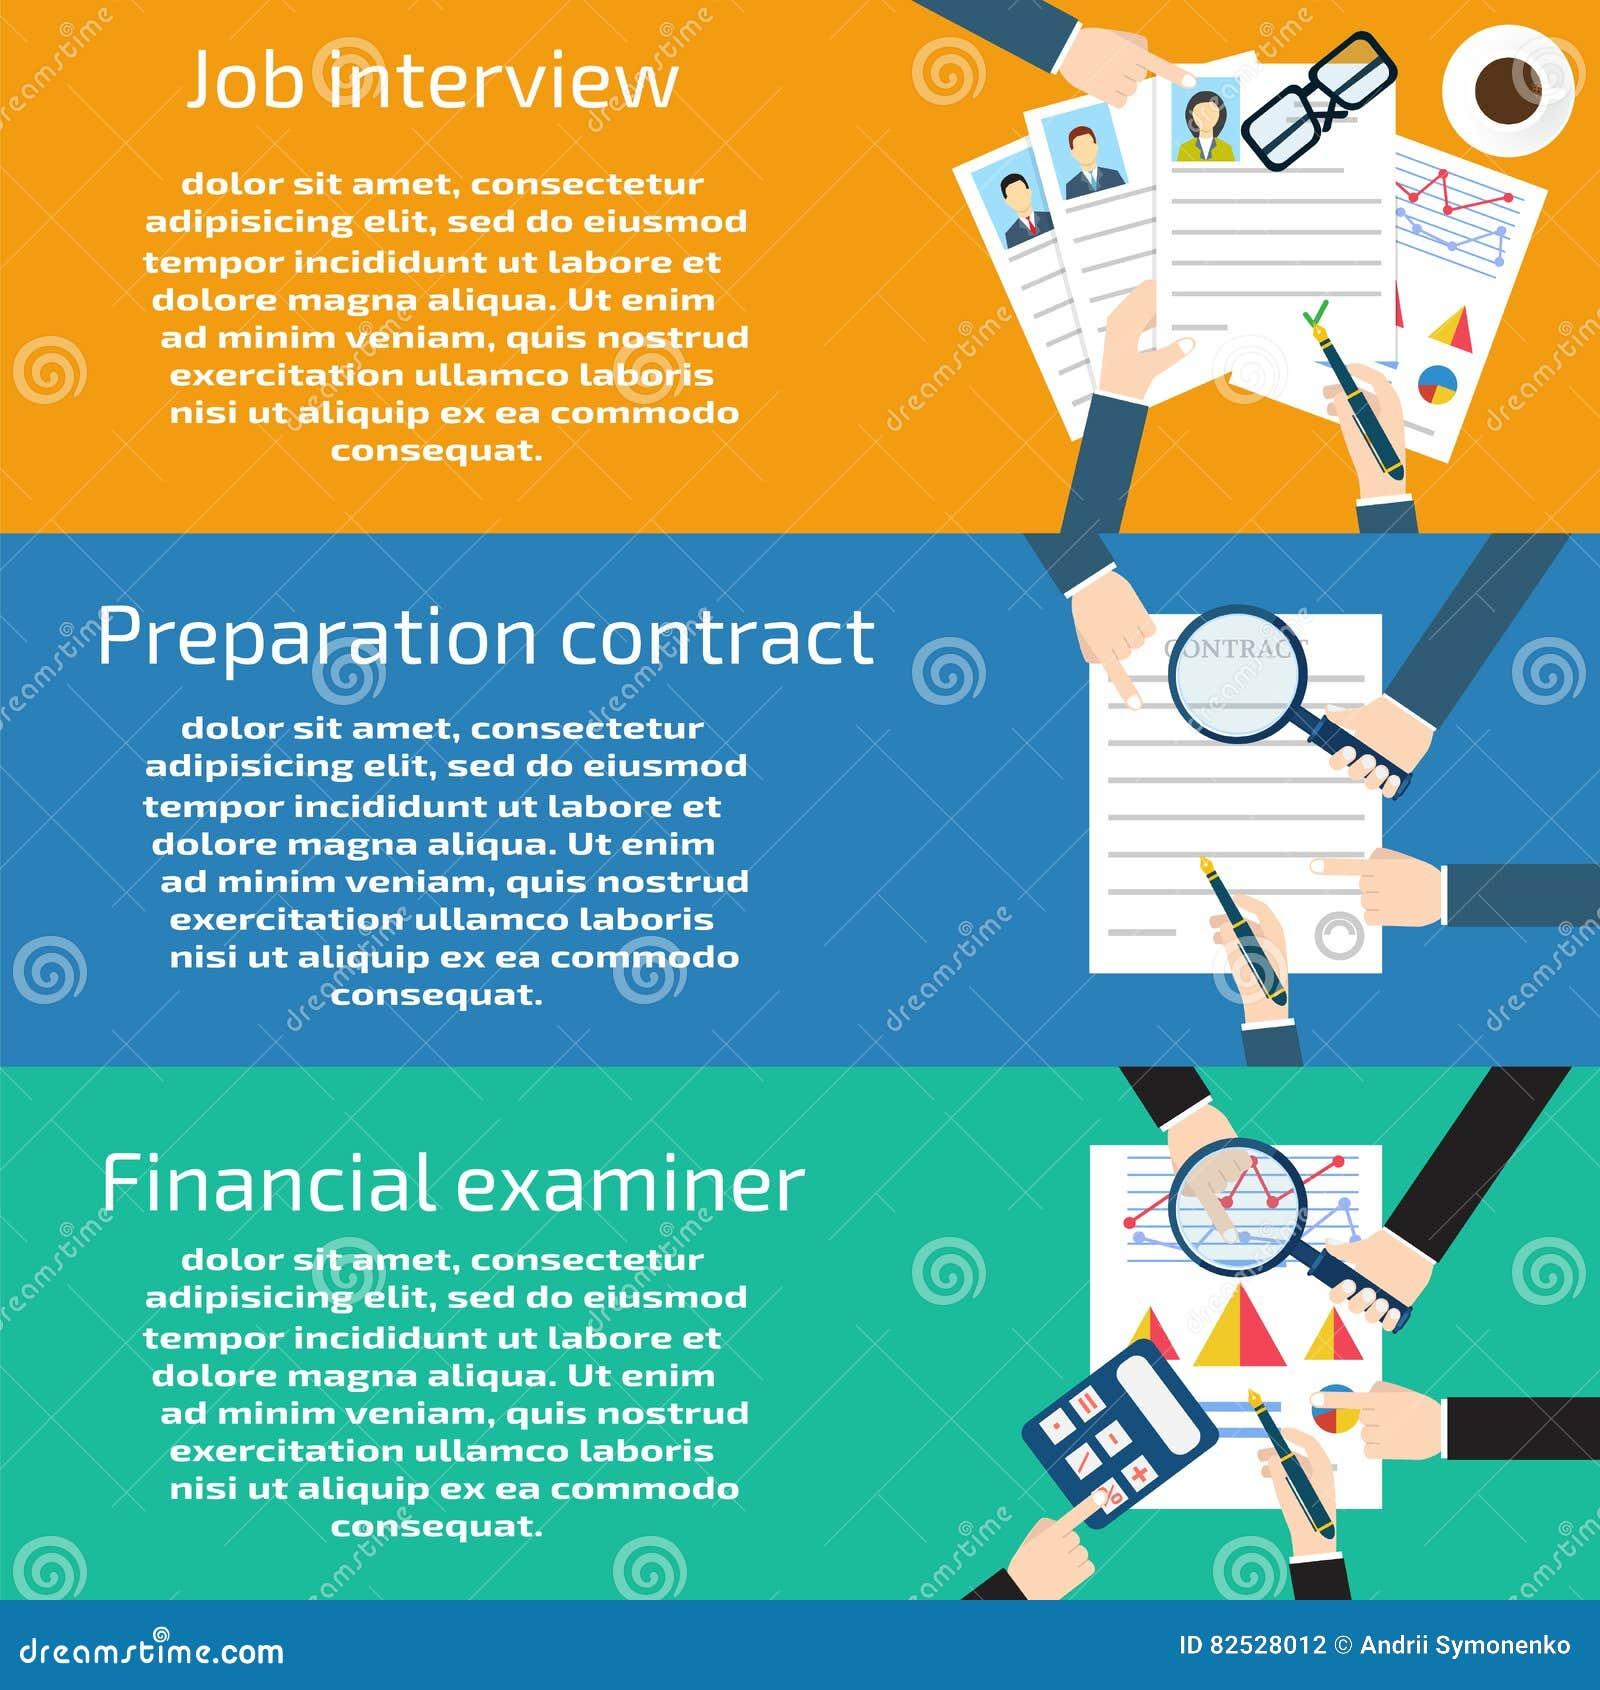 job interview preparation business stock vector image  job interview preparation business